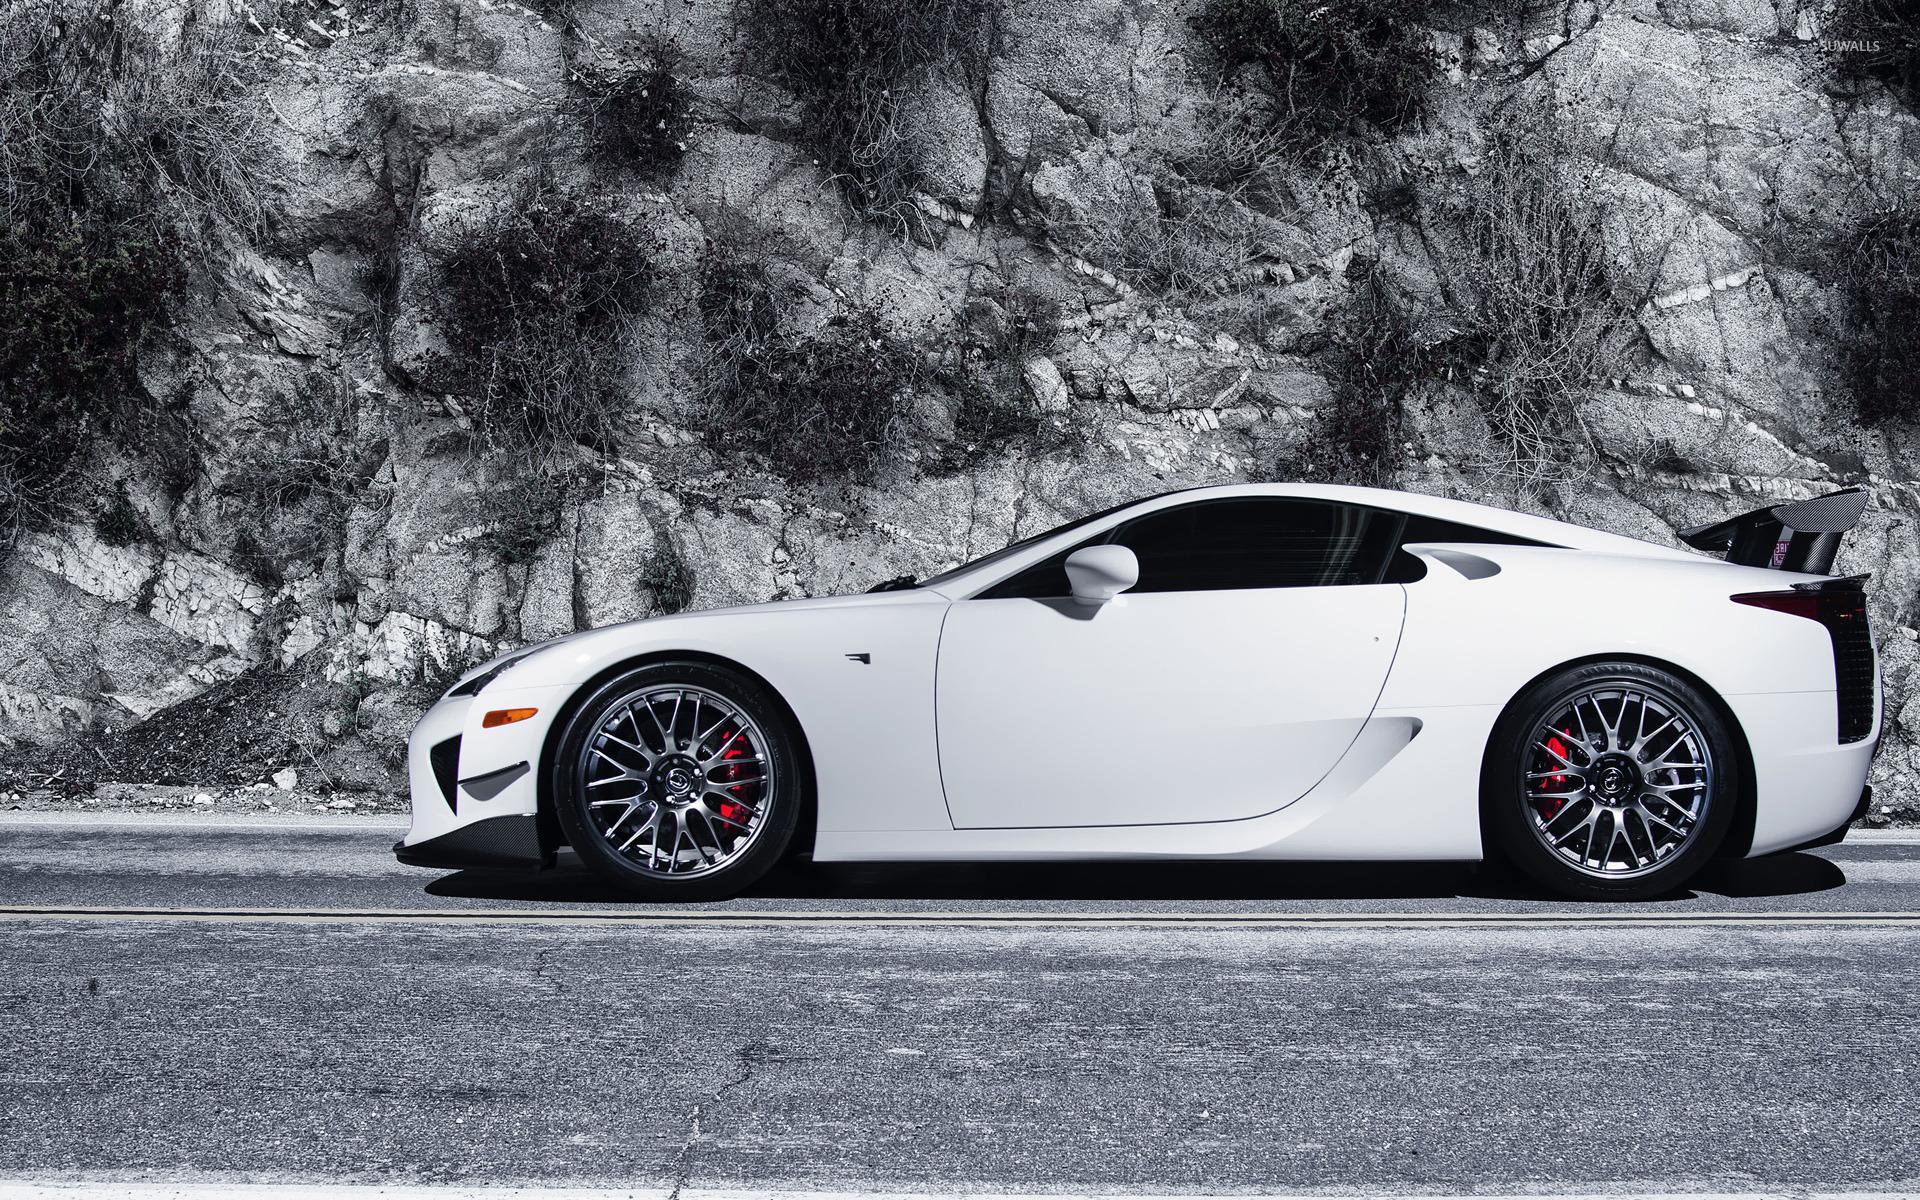 Elegant 2013 Lexus GS 350 F Sport Wallpaper